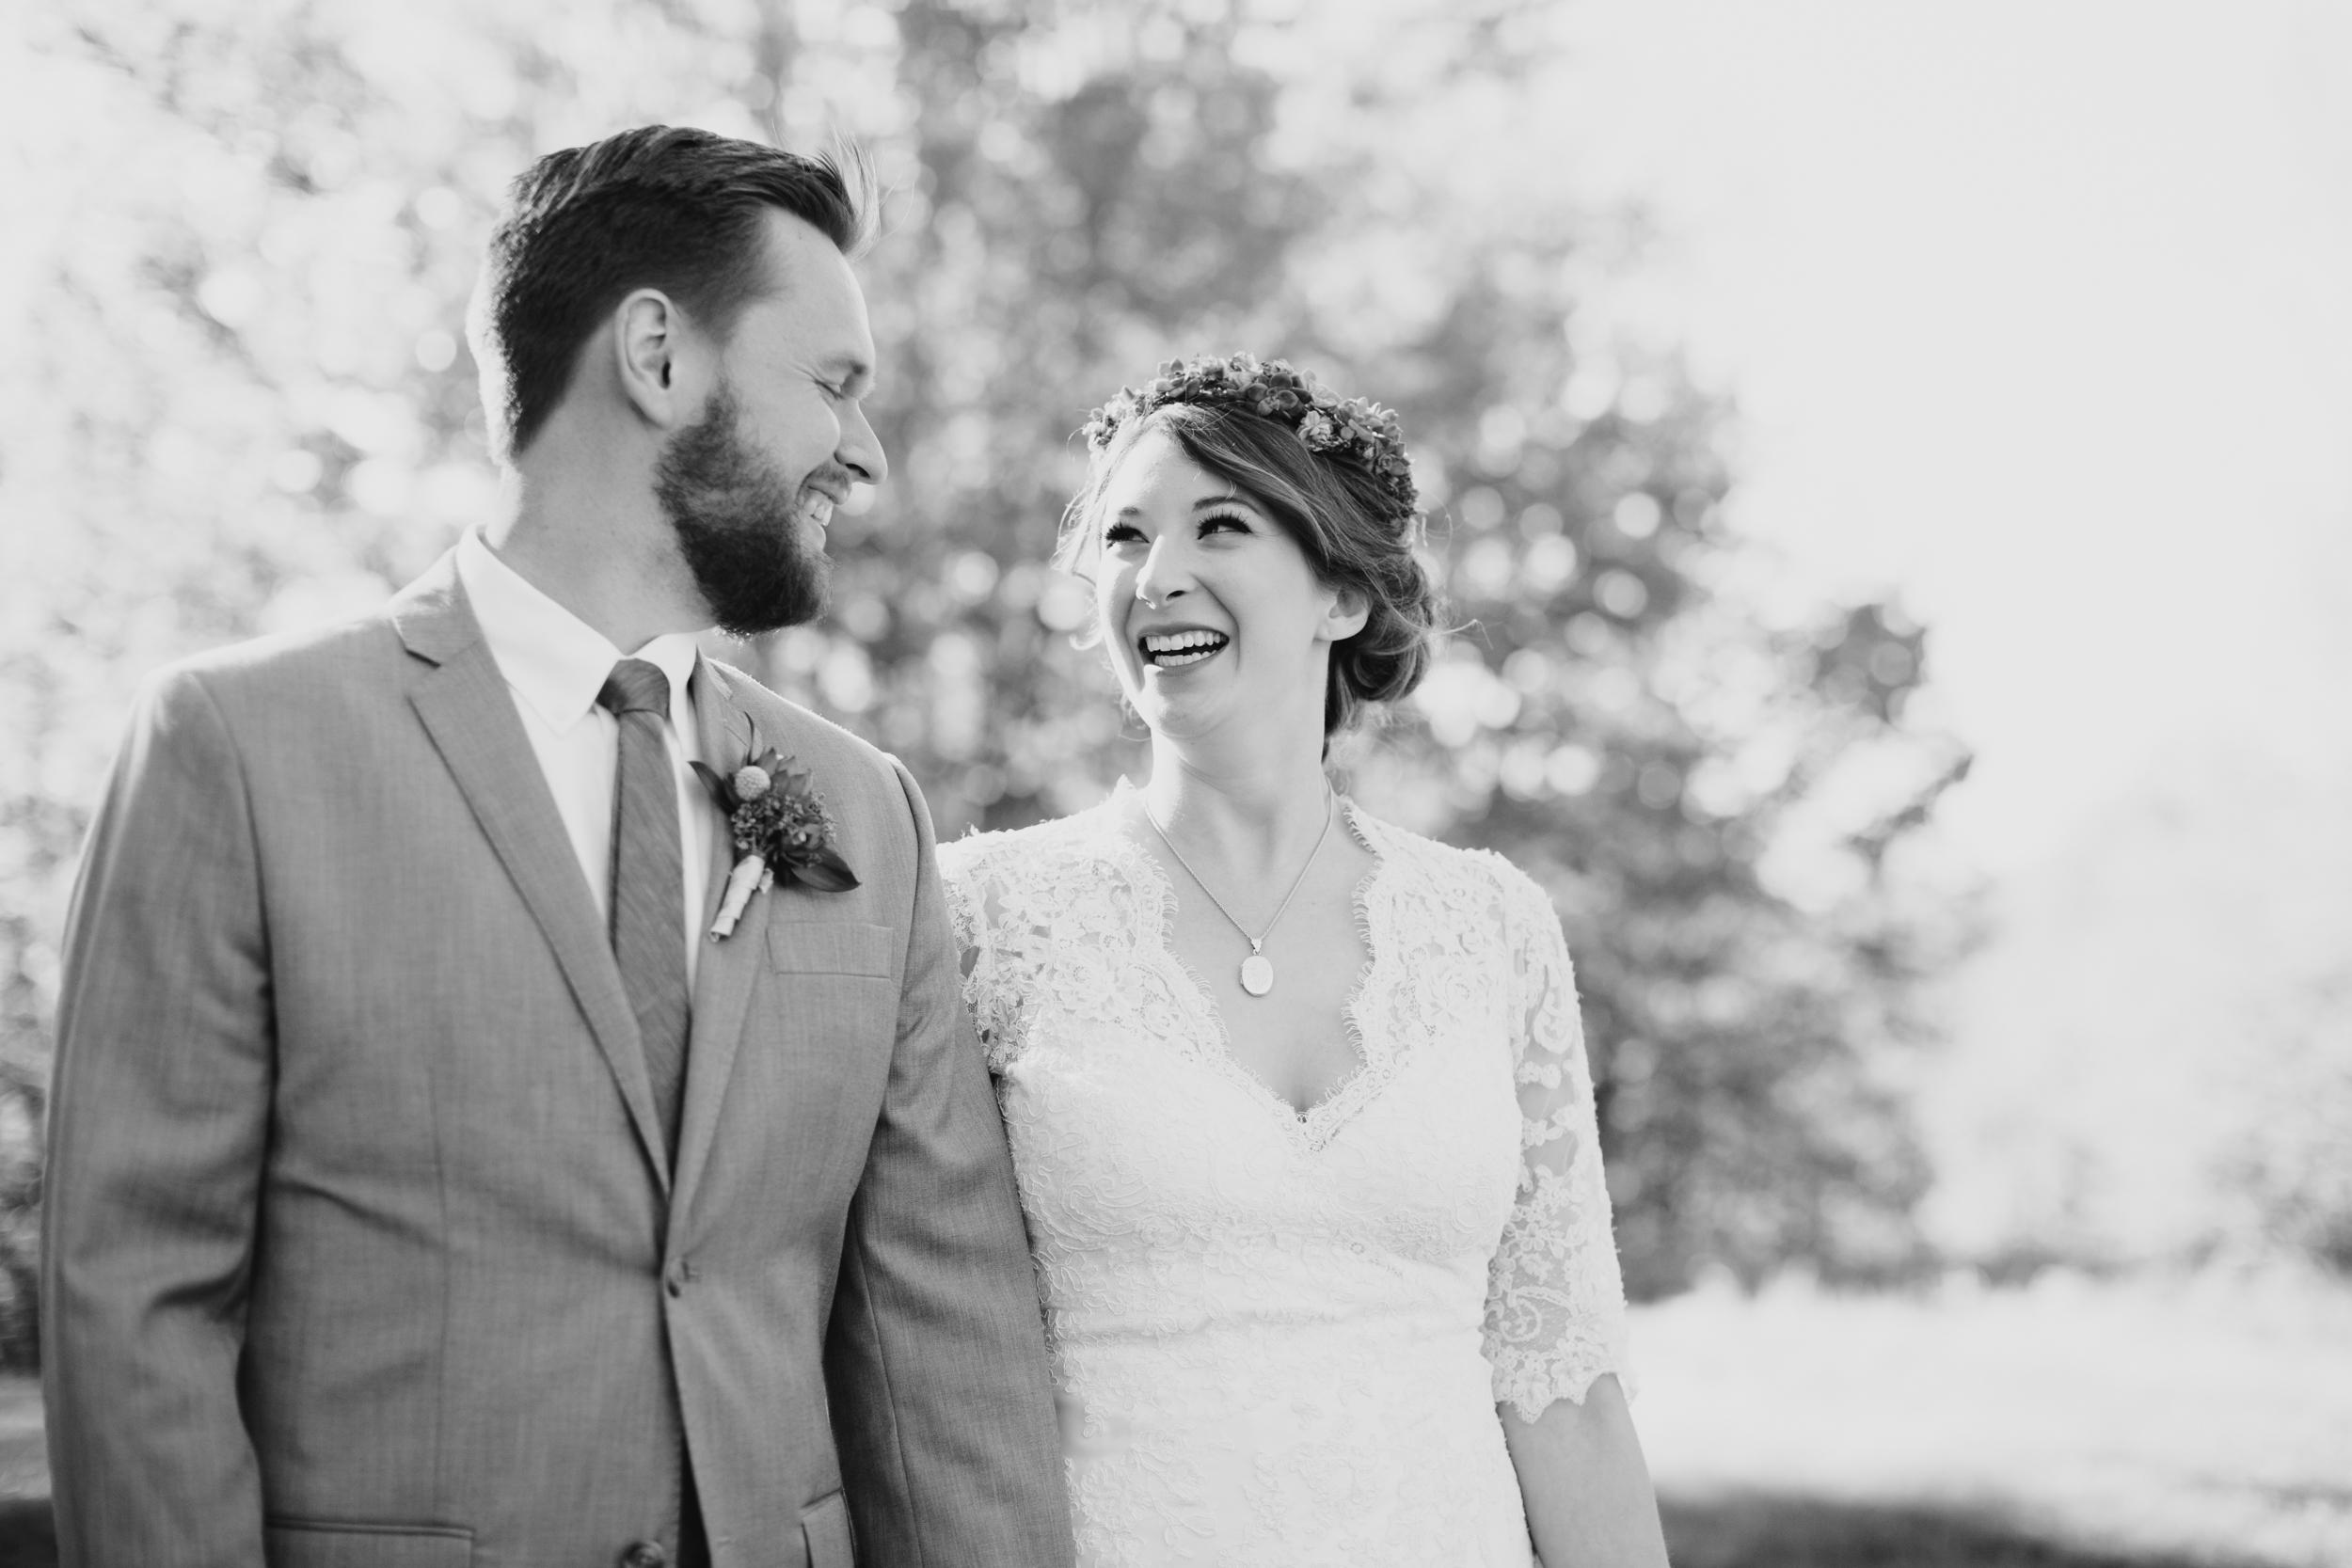 Spring-Meadows-Maine-Wedding-150.jpg